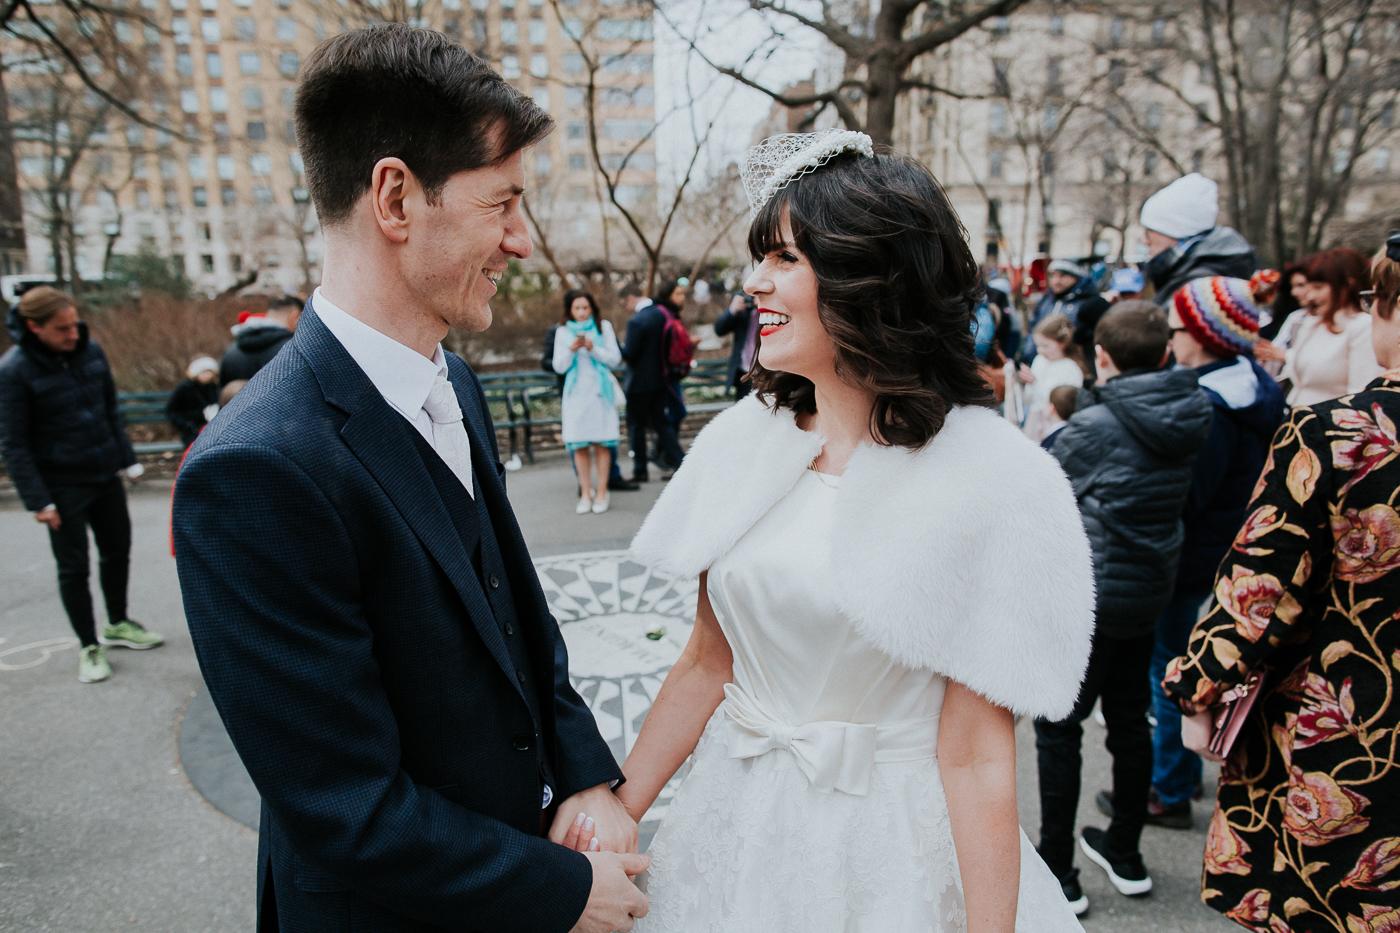 Ladies-Pavilion-Central-Park-NYC-Documentary-Elopement-Wedding-Photographer-43.jpg